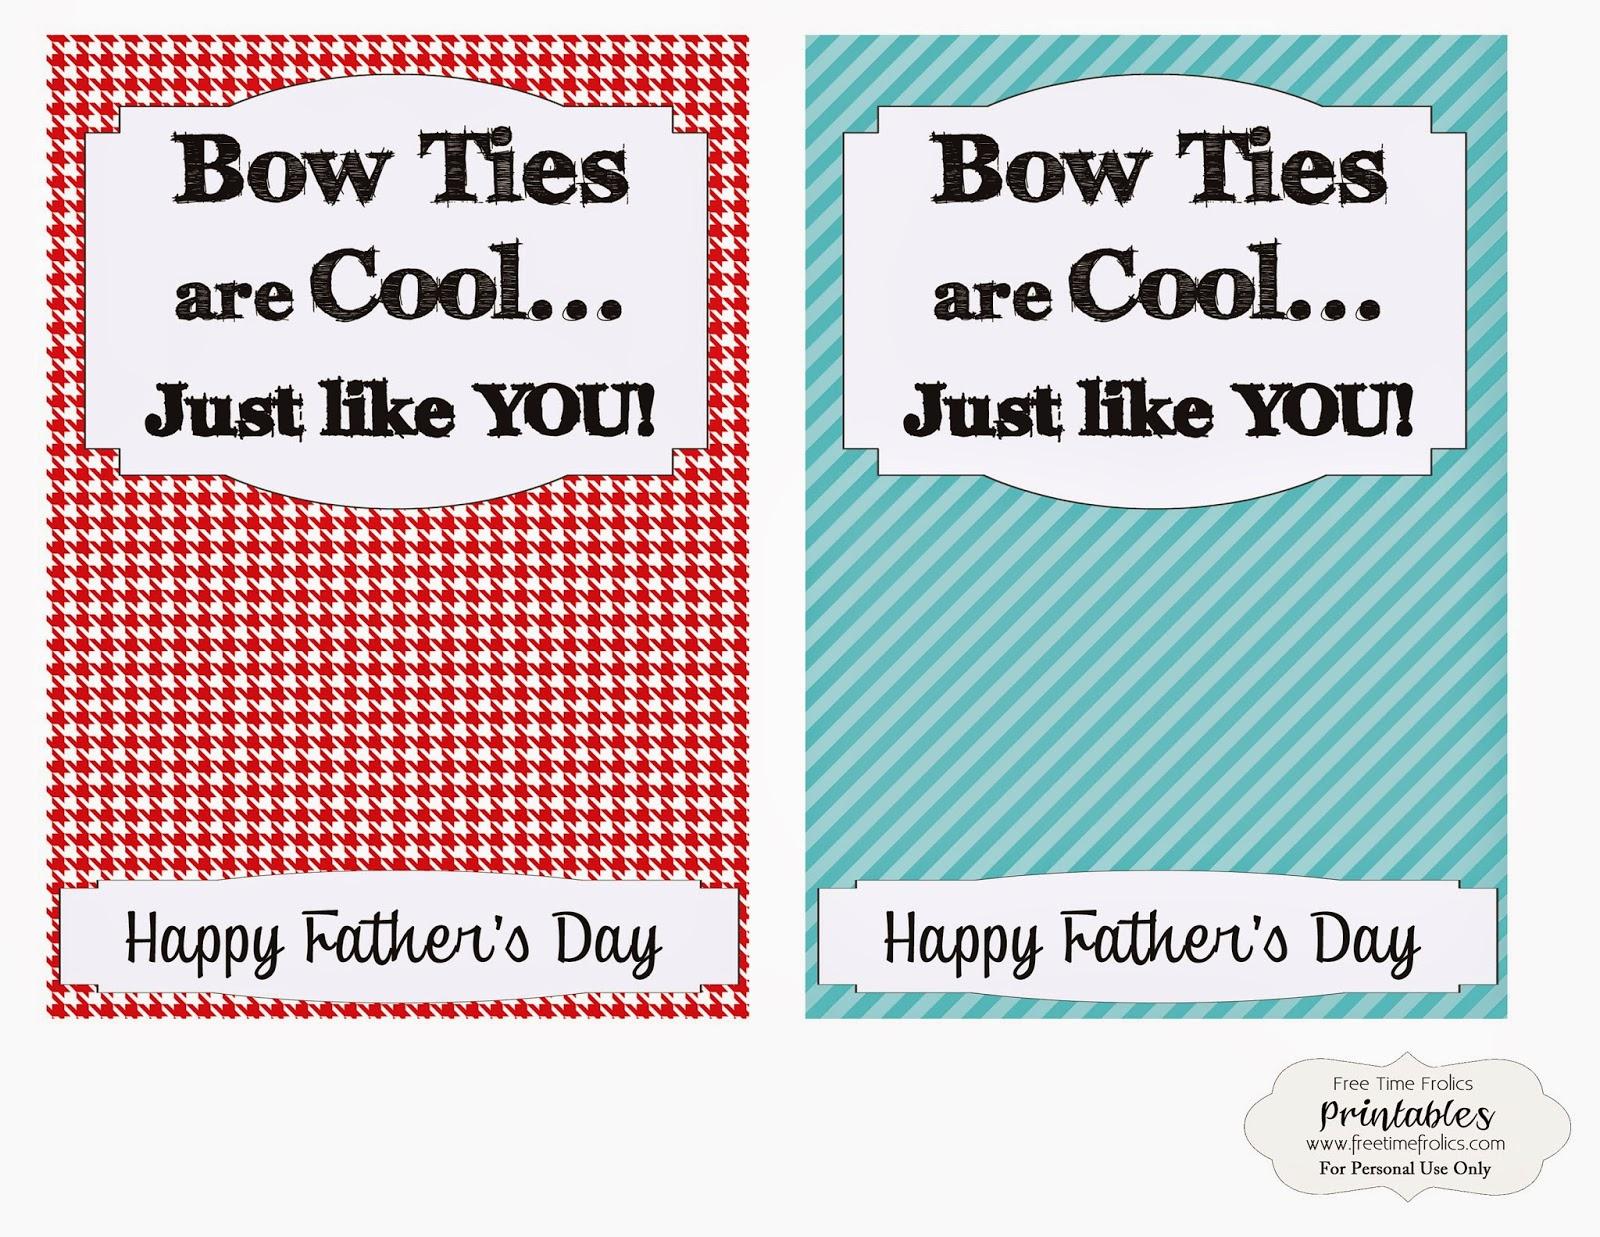 Dr who fathers day printable www.freetimefrolics.com #fathersday #drWho